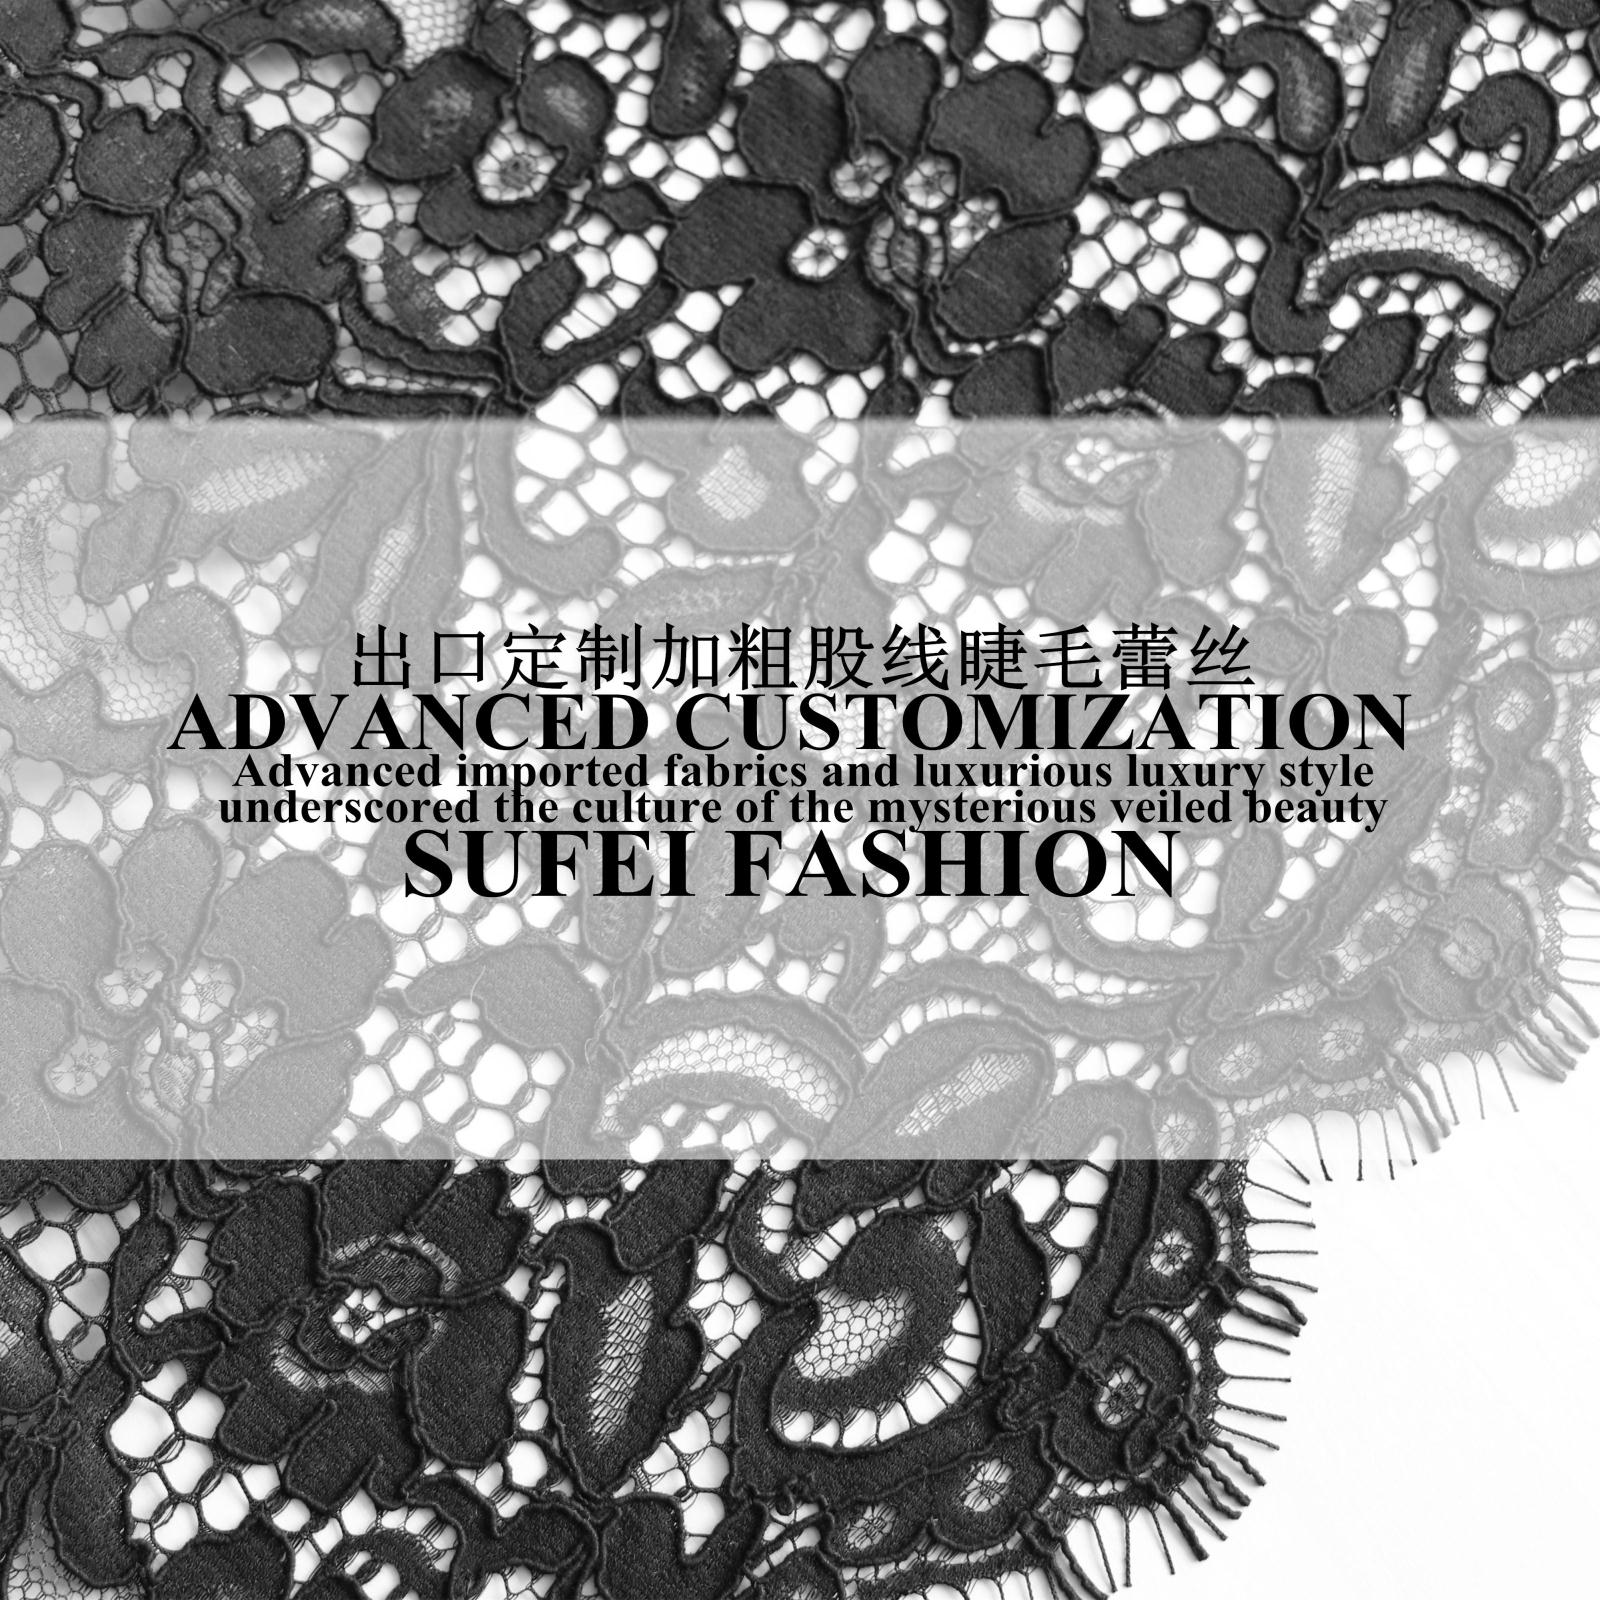 150 150cm delicated eyelash black cotton polyester lace dress clothes blouse fabric S219